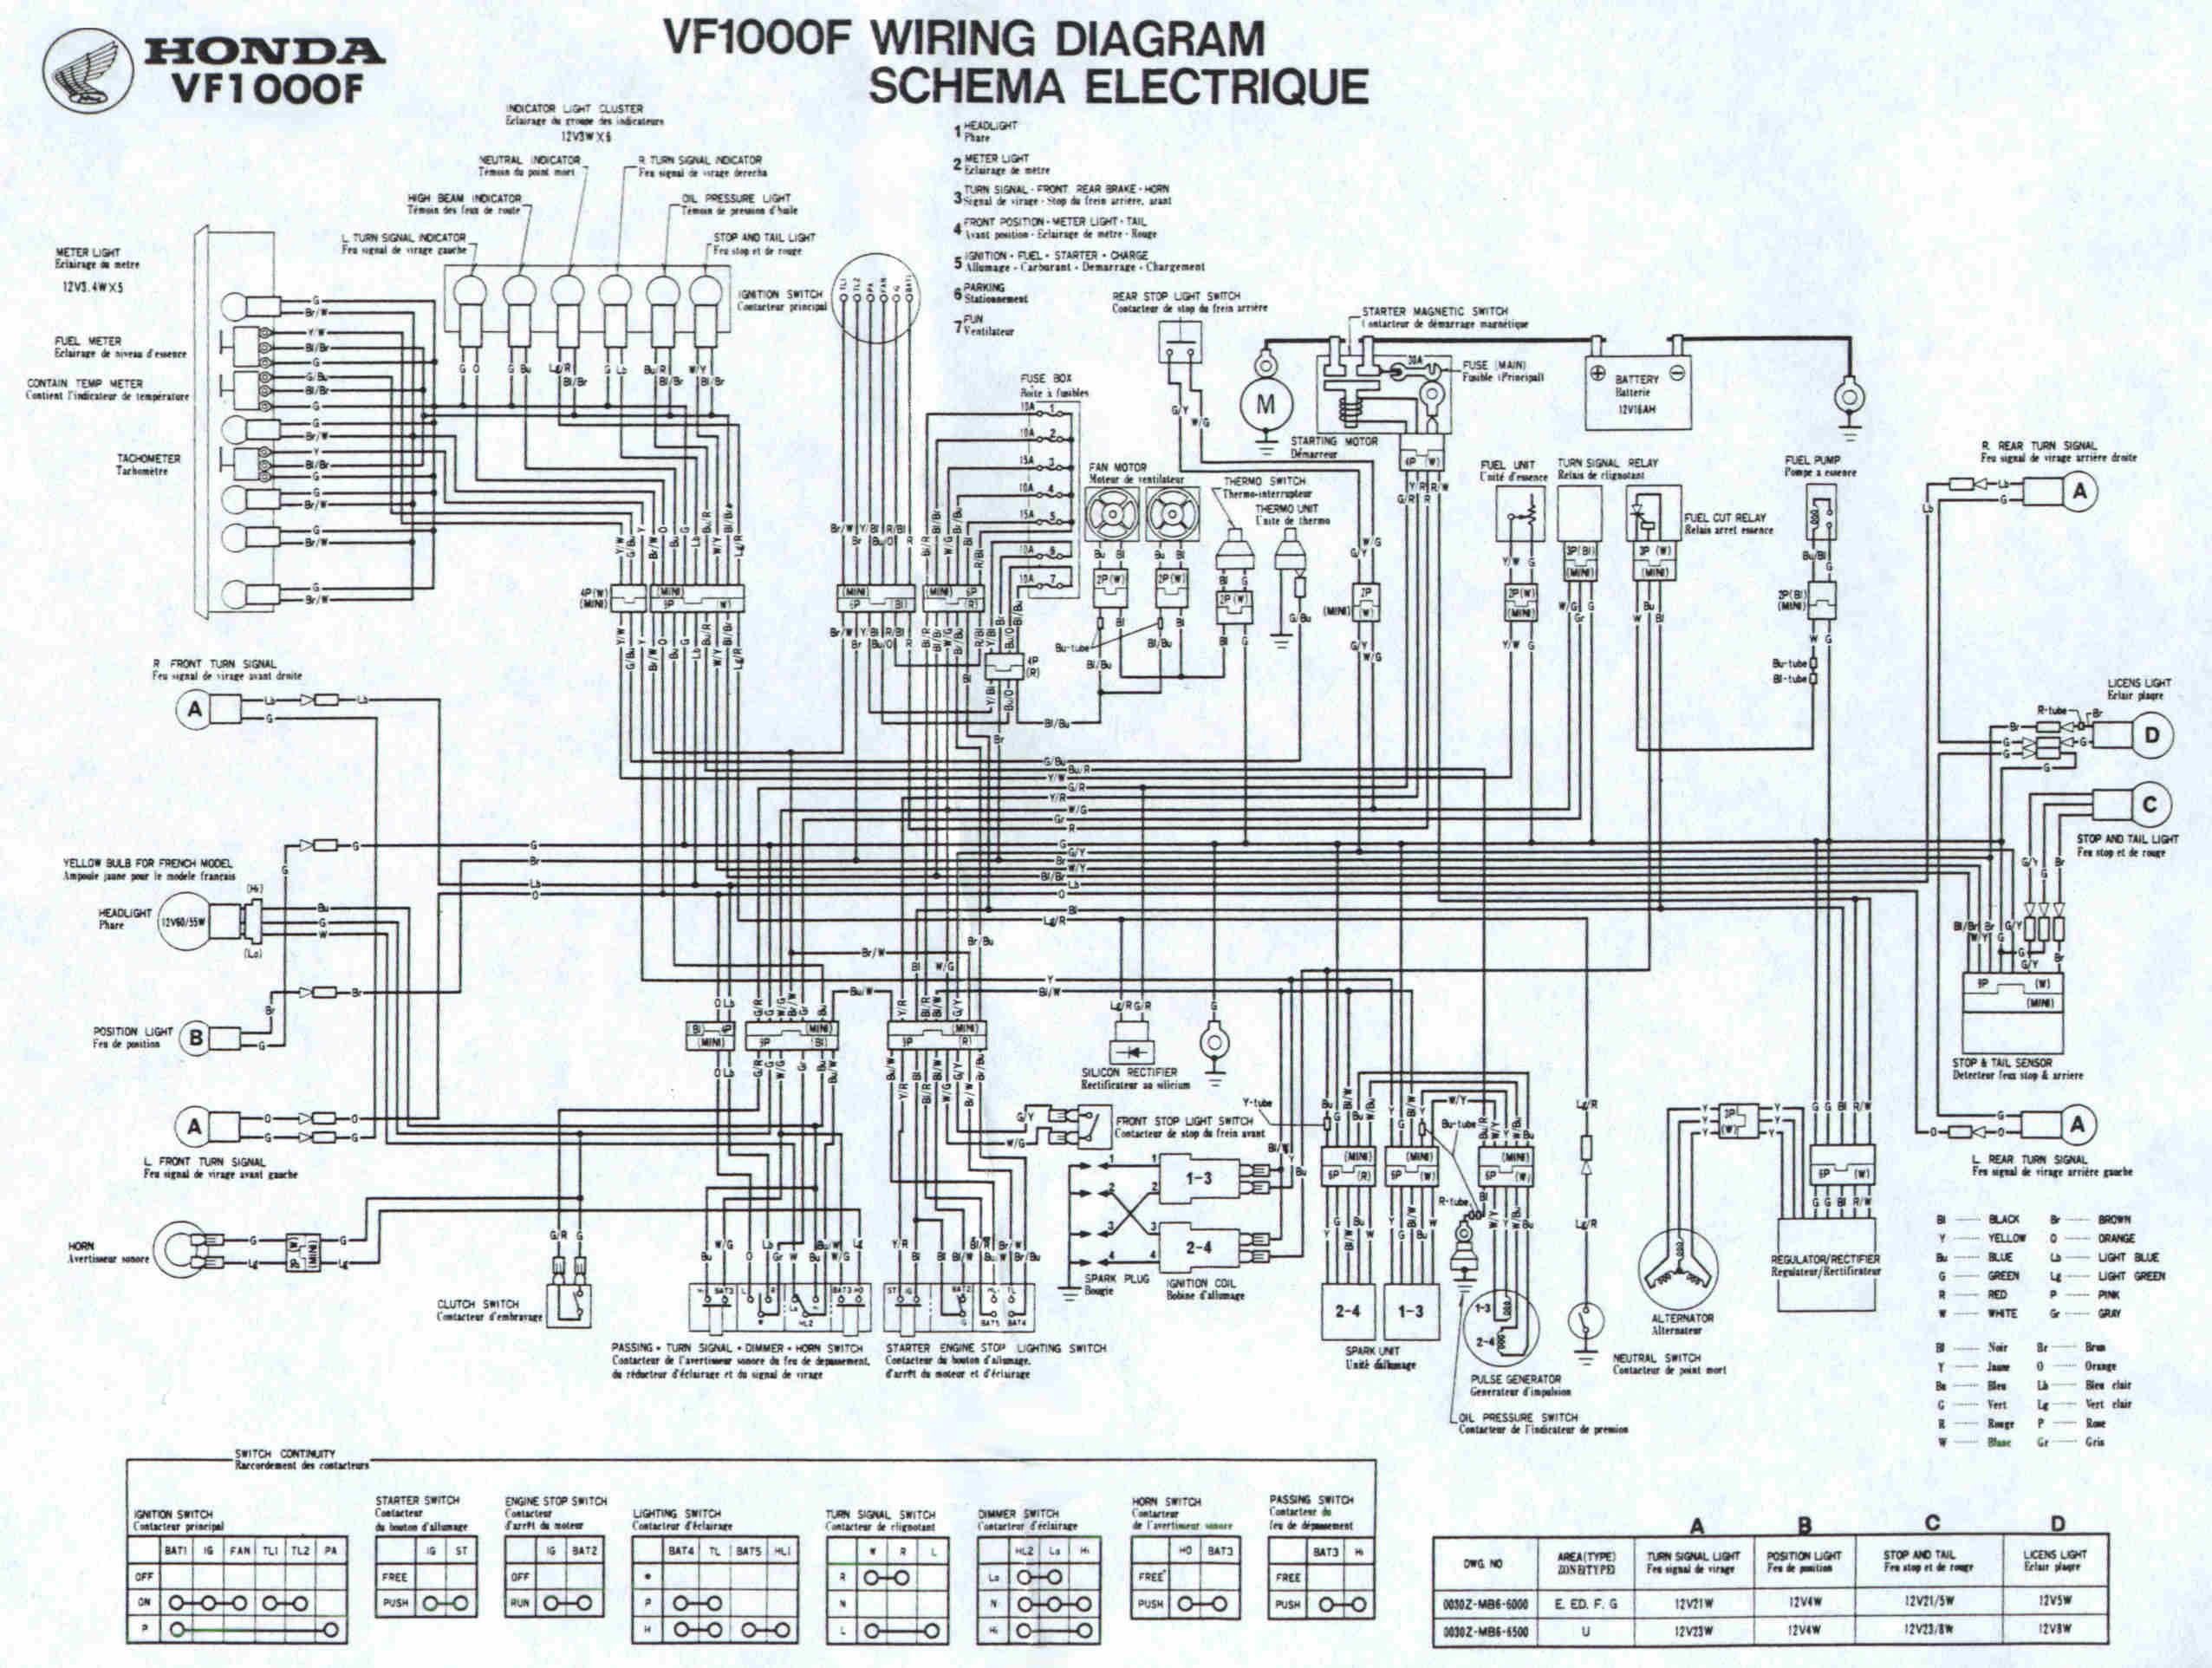 GS_3503] Honda Cb 650 Wiring Diagram Free DiagramLukep Gentot Oupli Ginia Mohammedshrine Librar Wiring 101